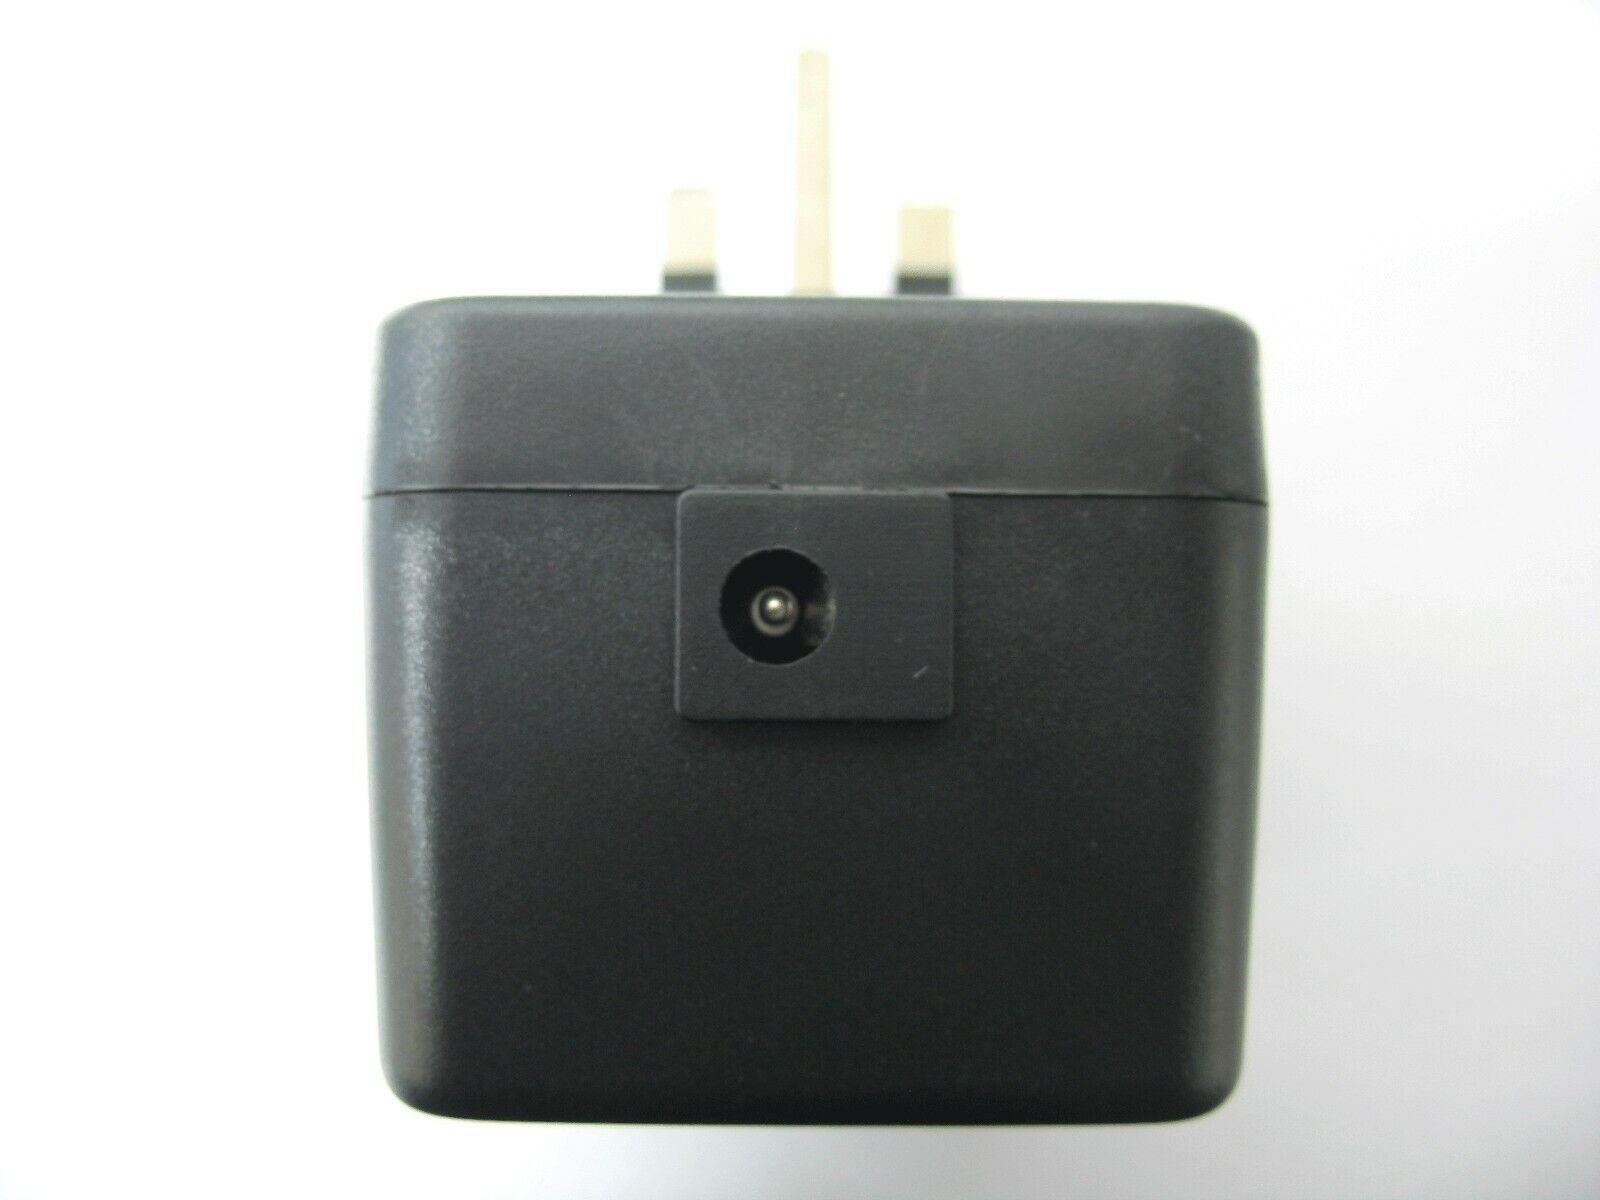 0.85 amp 24 volt Socket AC-AC (AC Output) Power Adaptor/Supply/Charger 20.4 watt